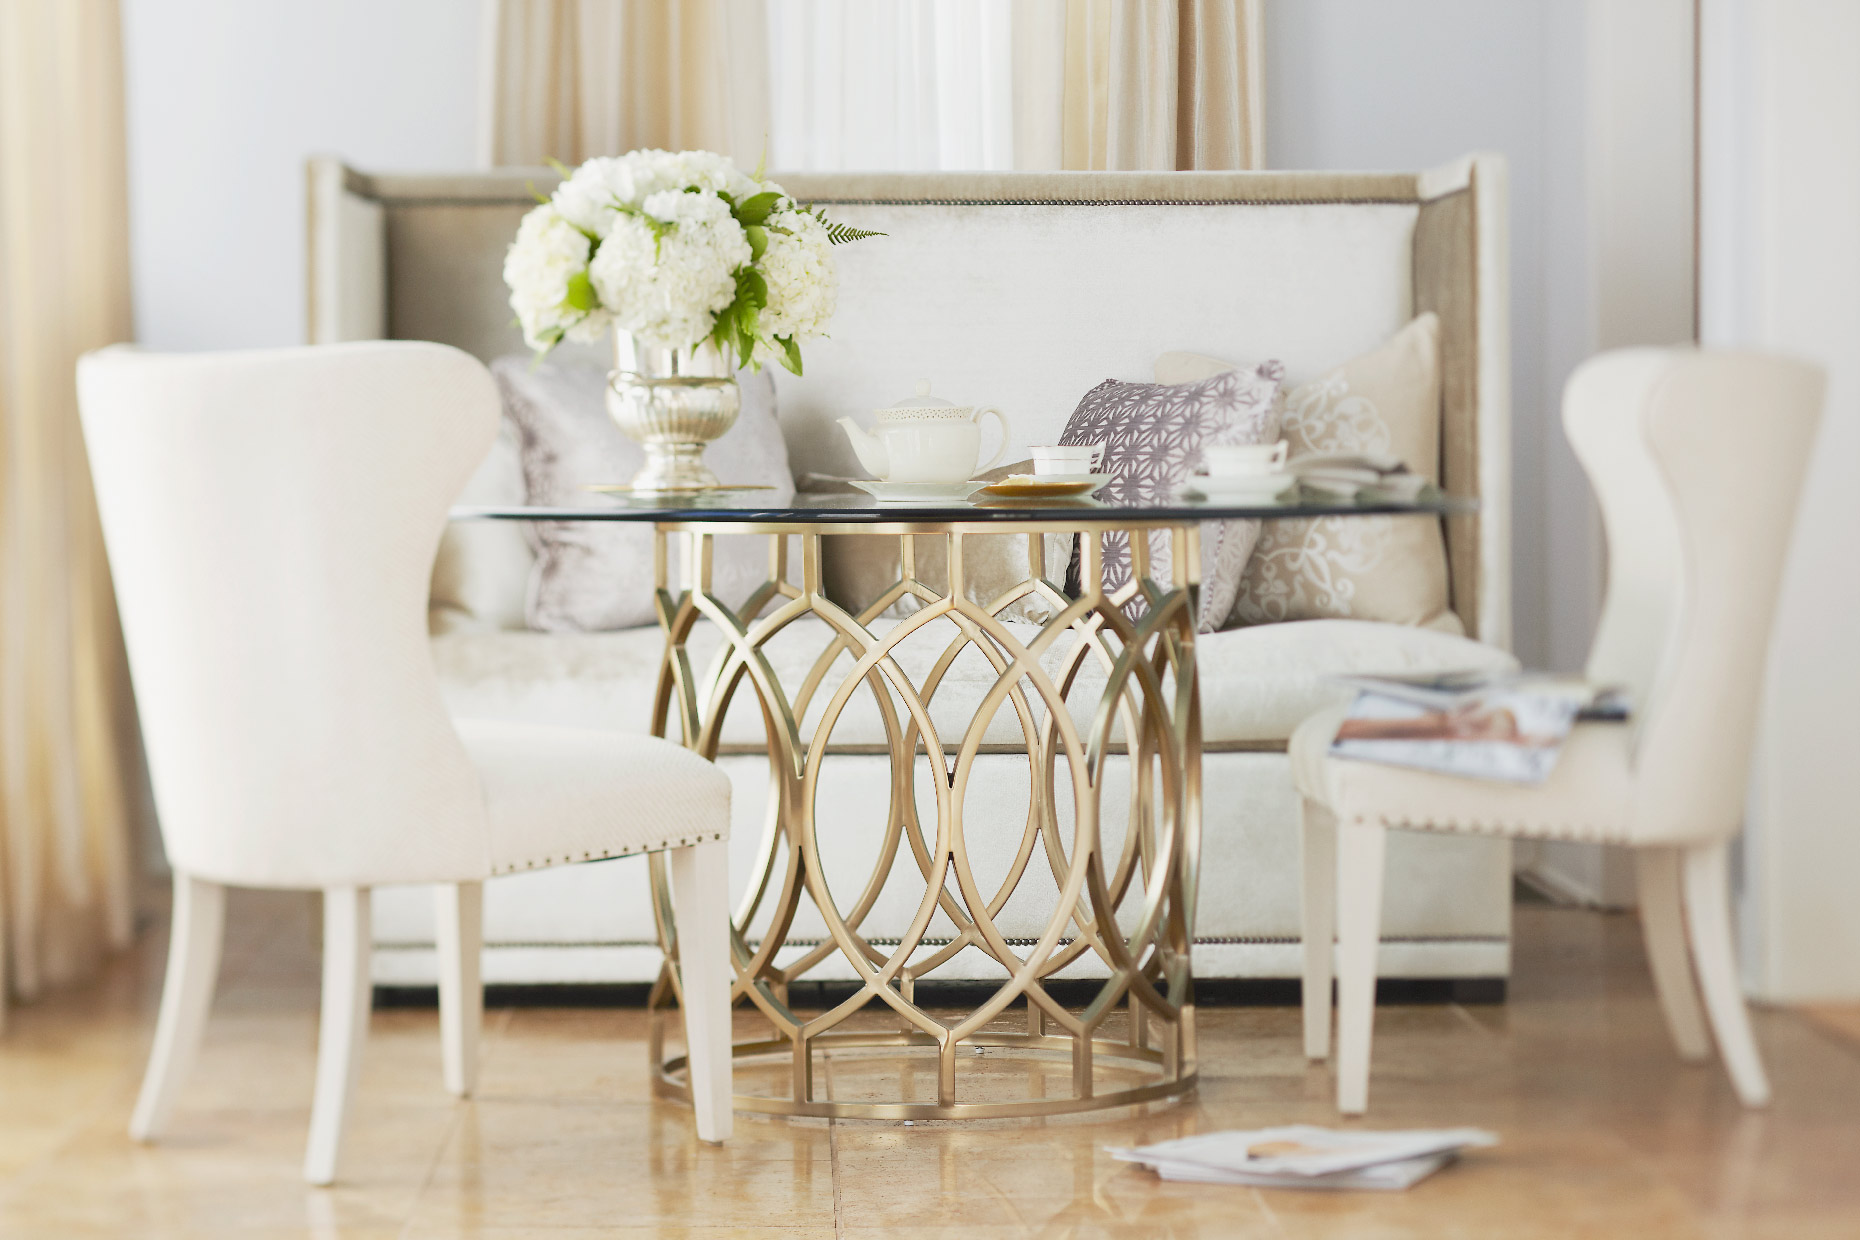 Stacey Van Berkel Photography I Elegant tea time I Bernhardt Furniture